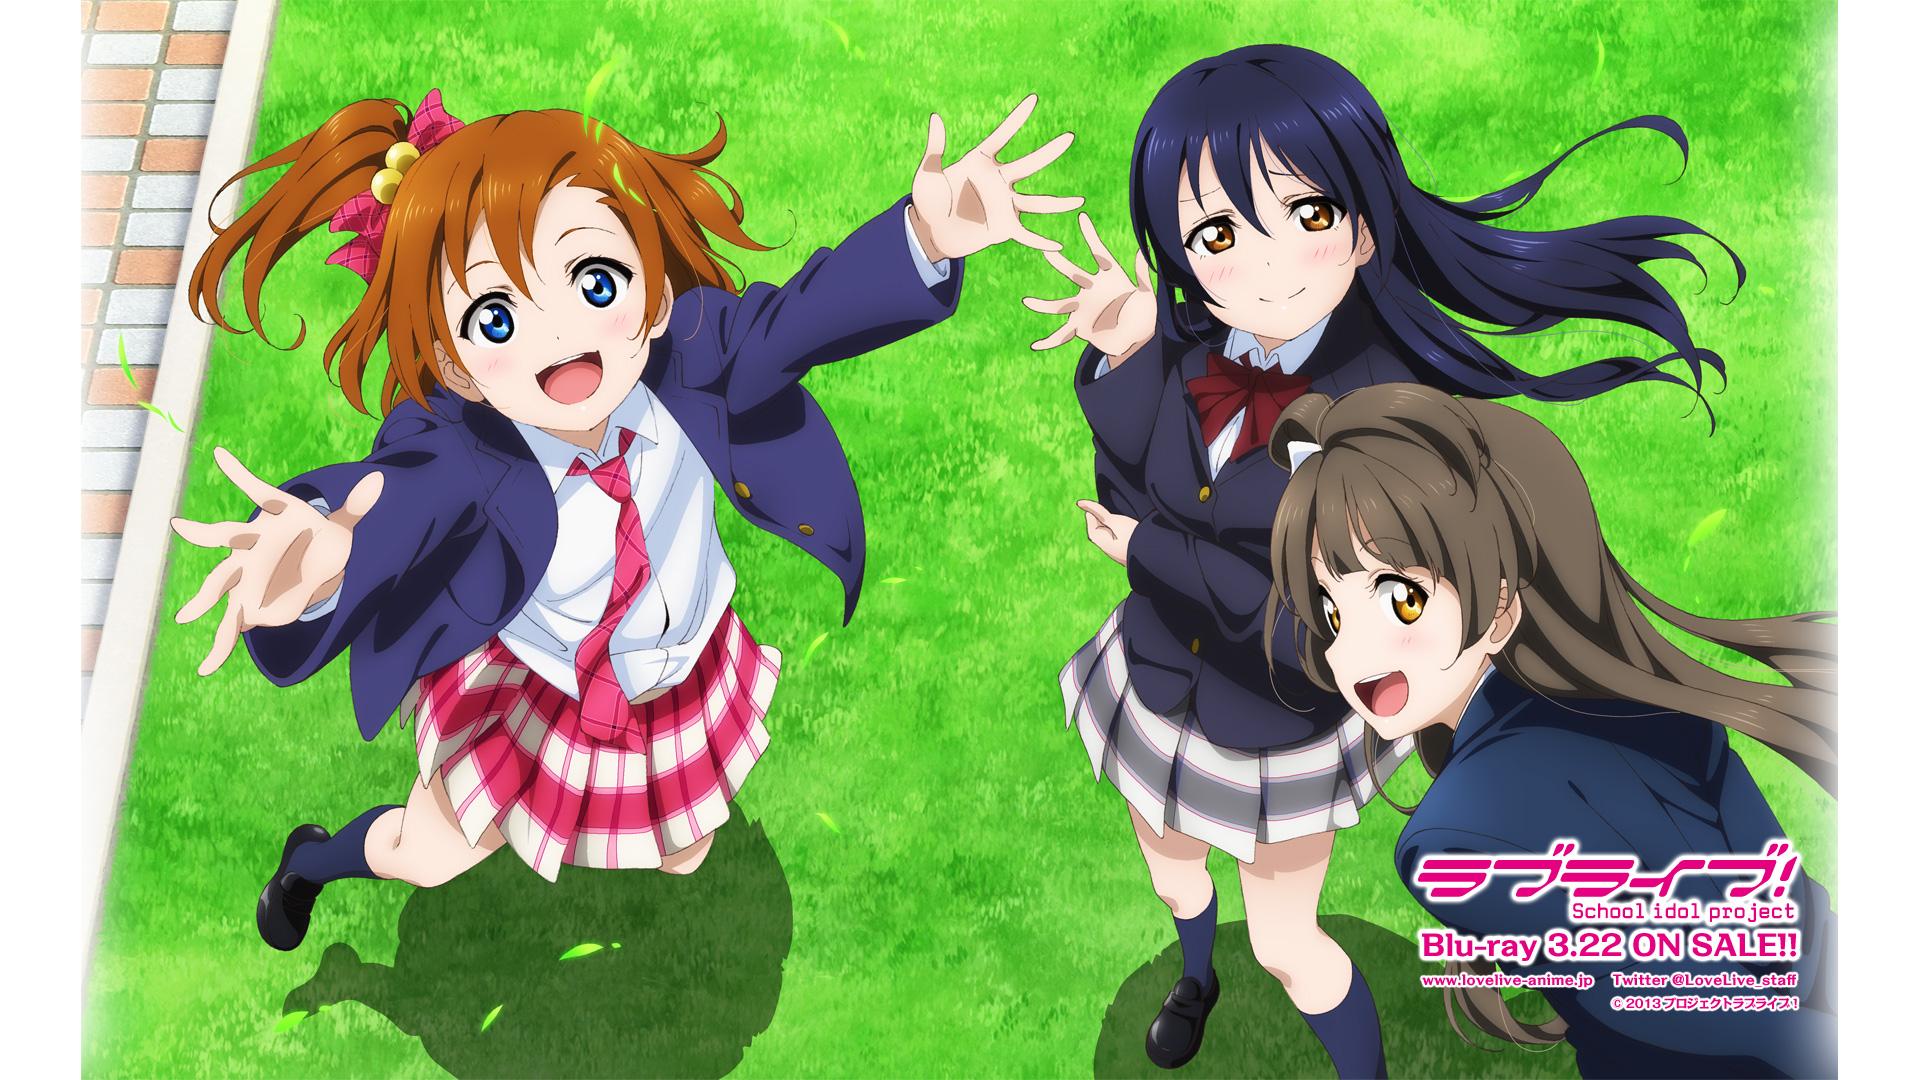 Love Live Wallpaper Hd New: Love Live! HD Wallpaper #1437733